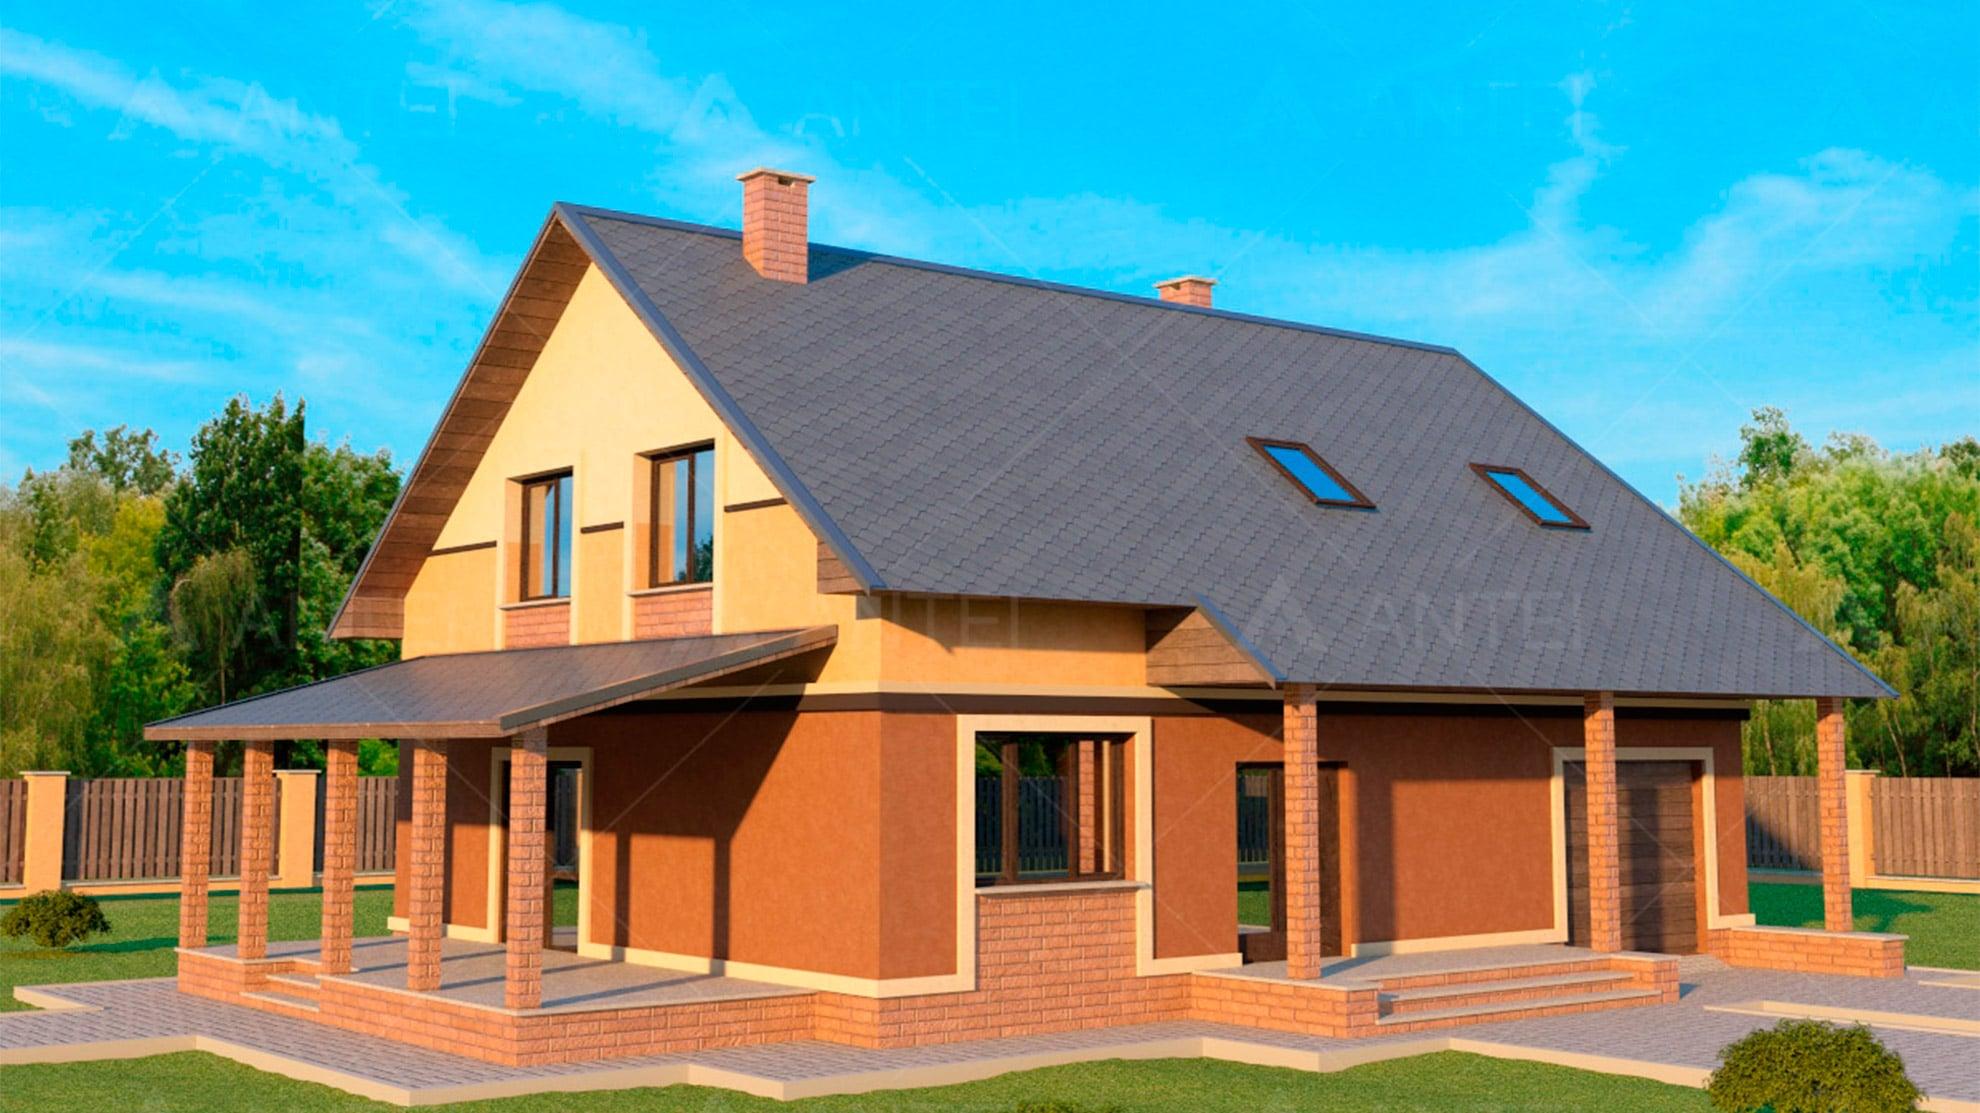 Проект мансардного дома с гаражом «КМ-18» - фото №1